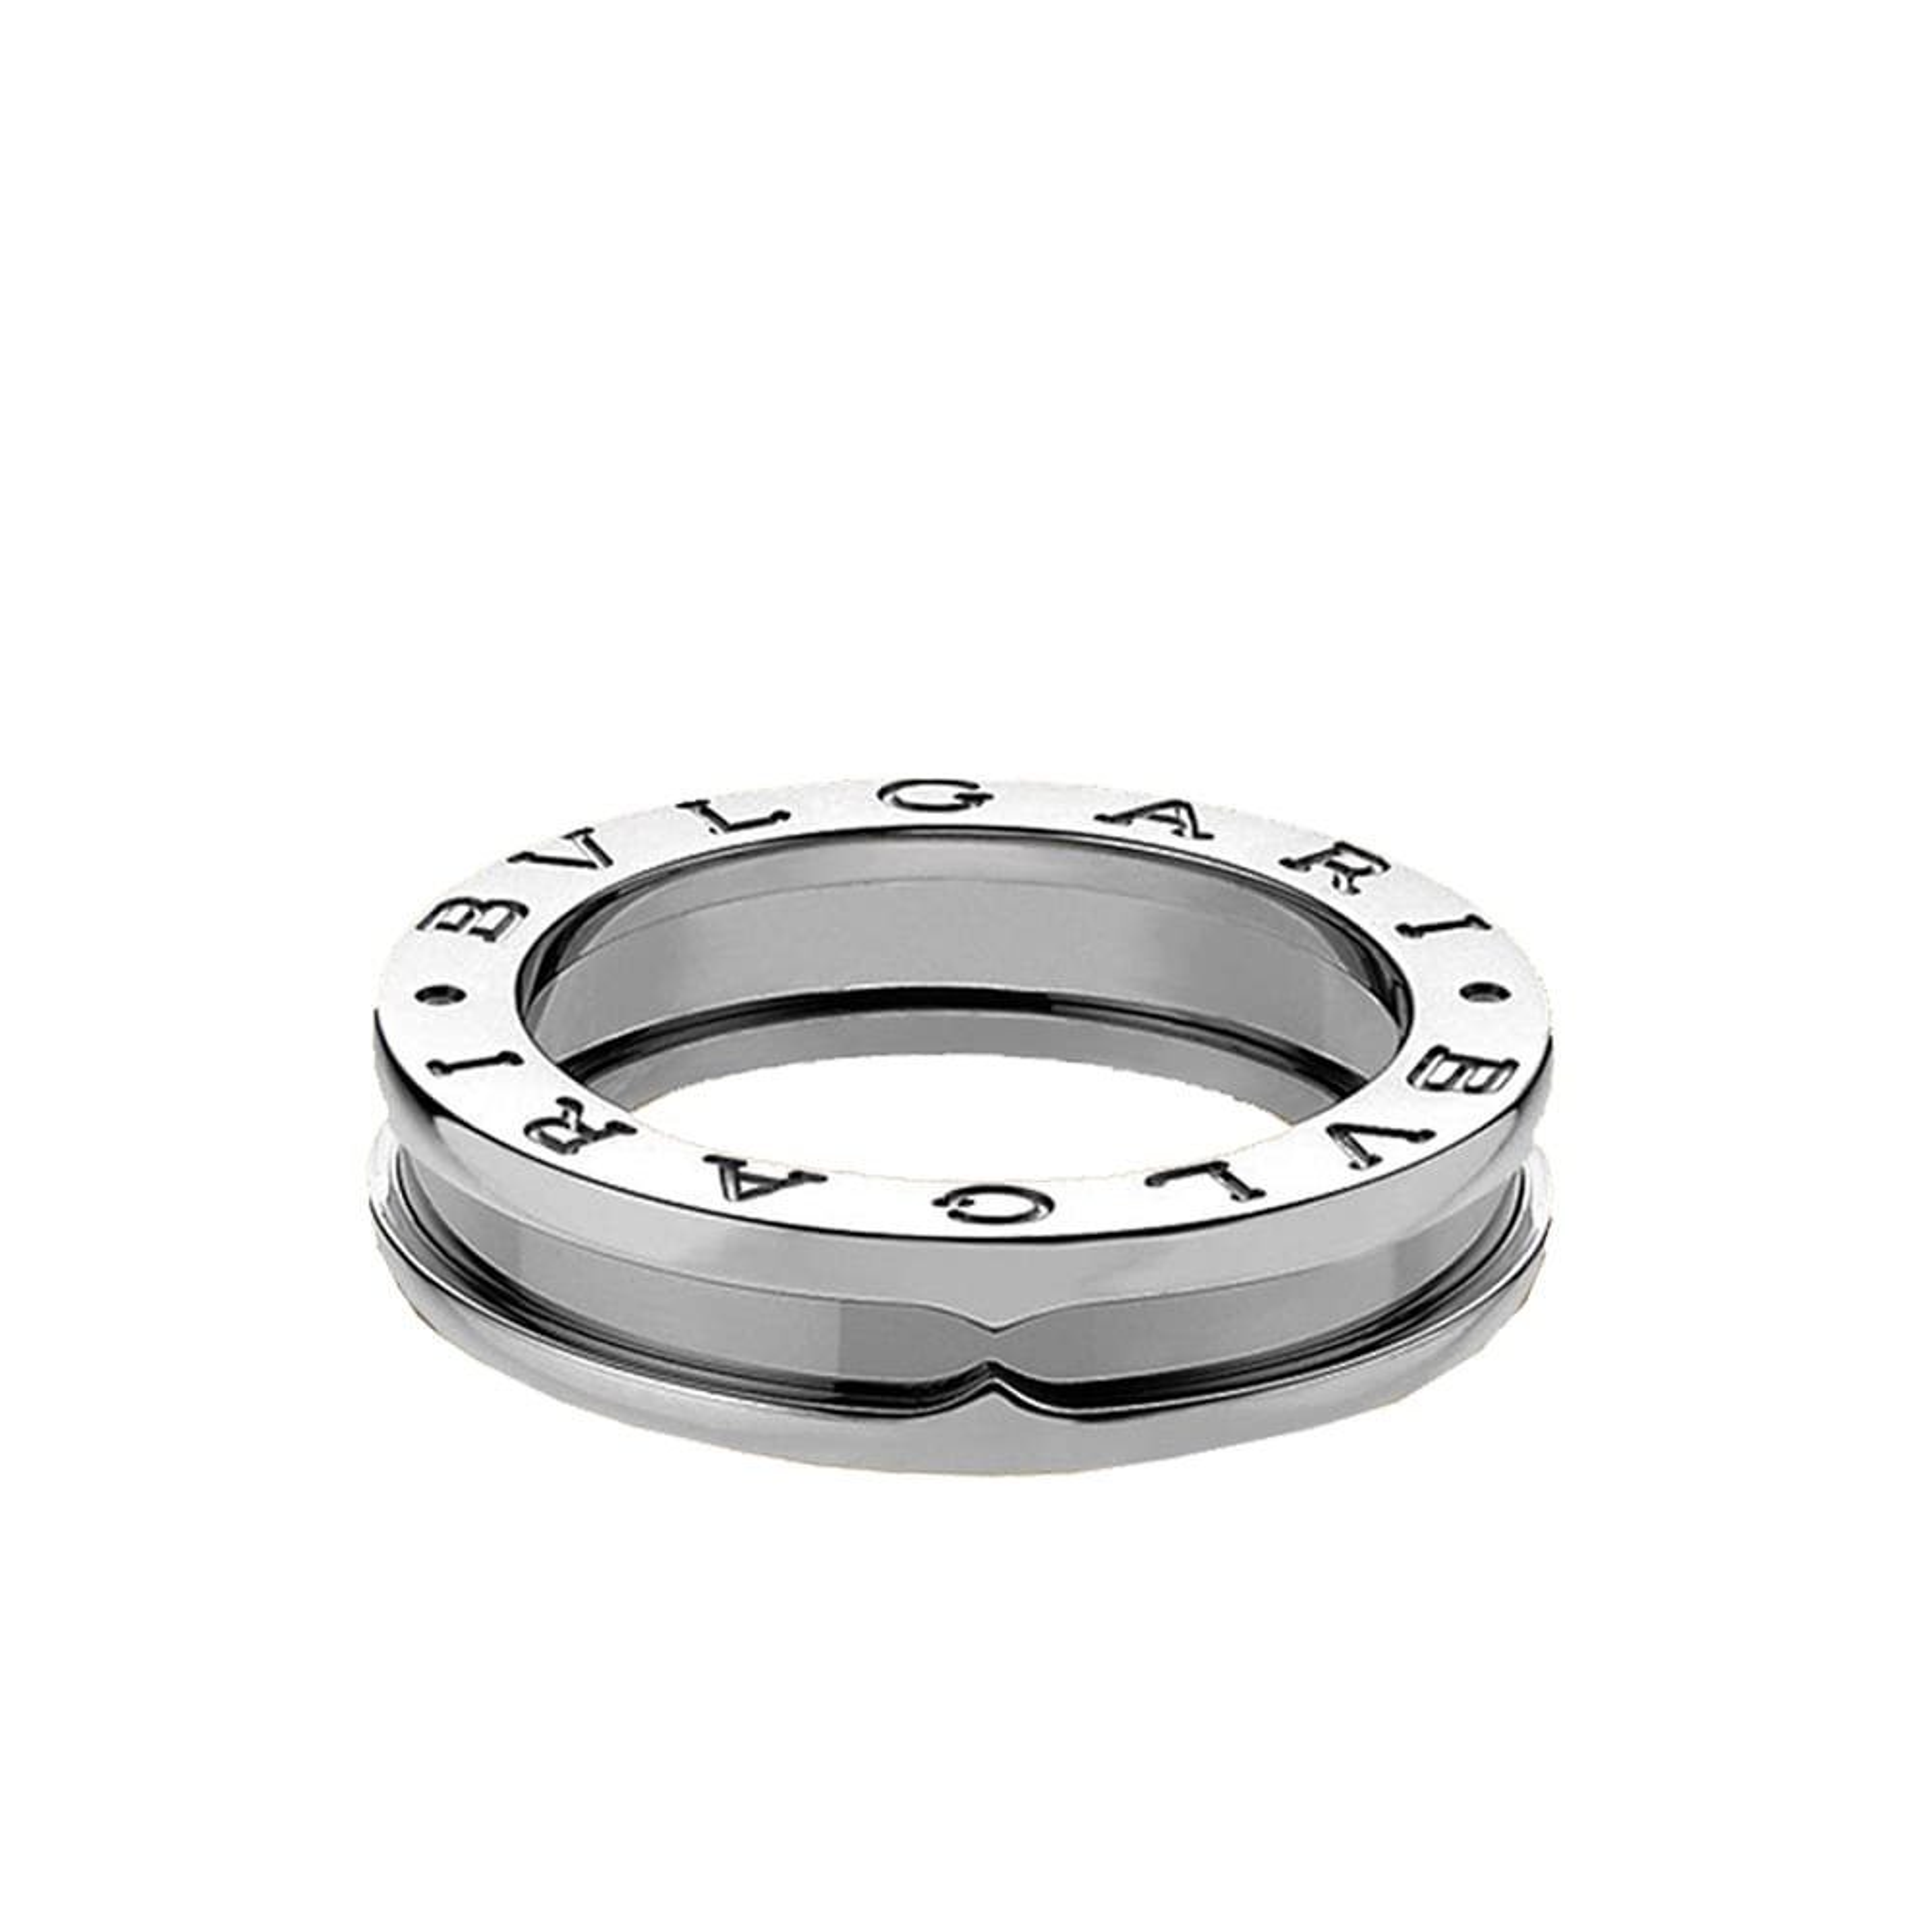 Bvlgari Ct White Gold Ring